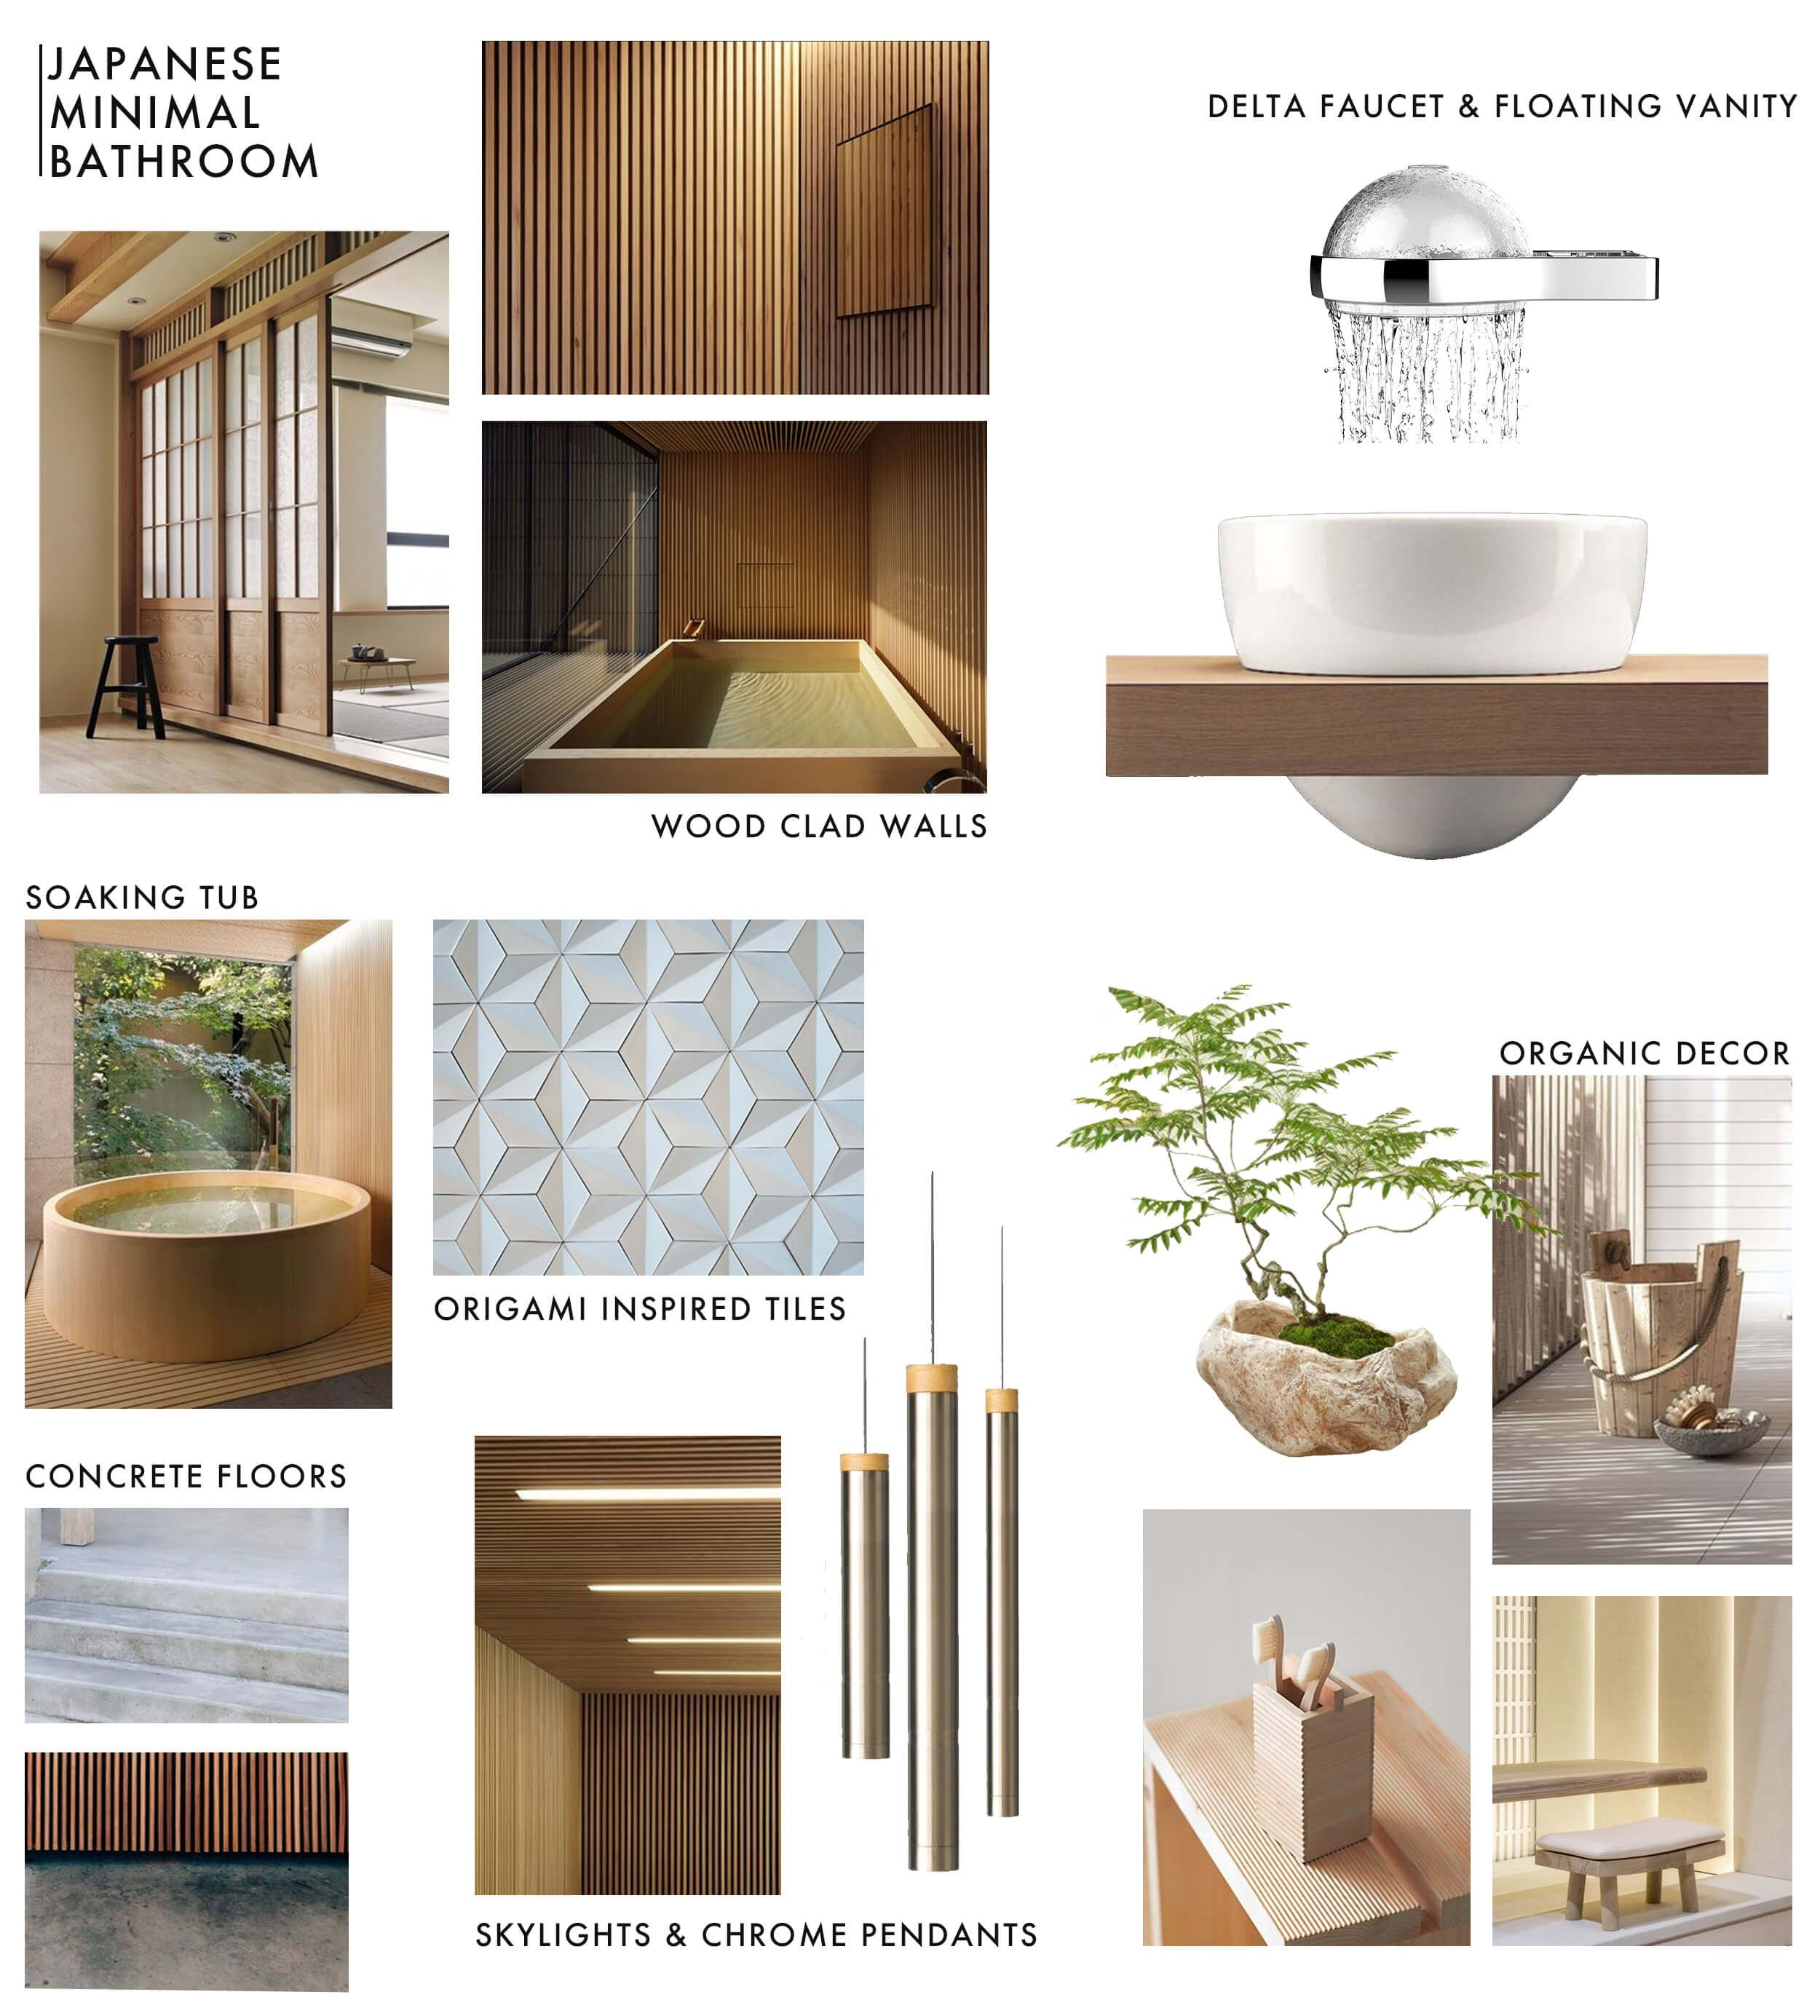 Japanese Minimal Bathrooom Delta Faucet Moodboard | Home Again ...